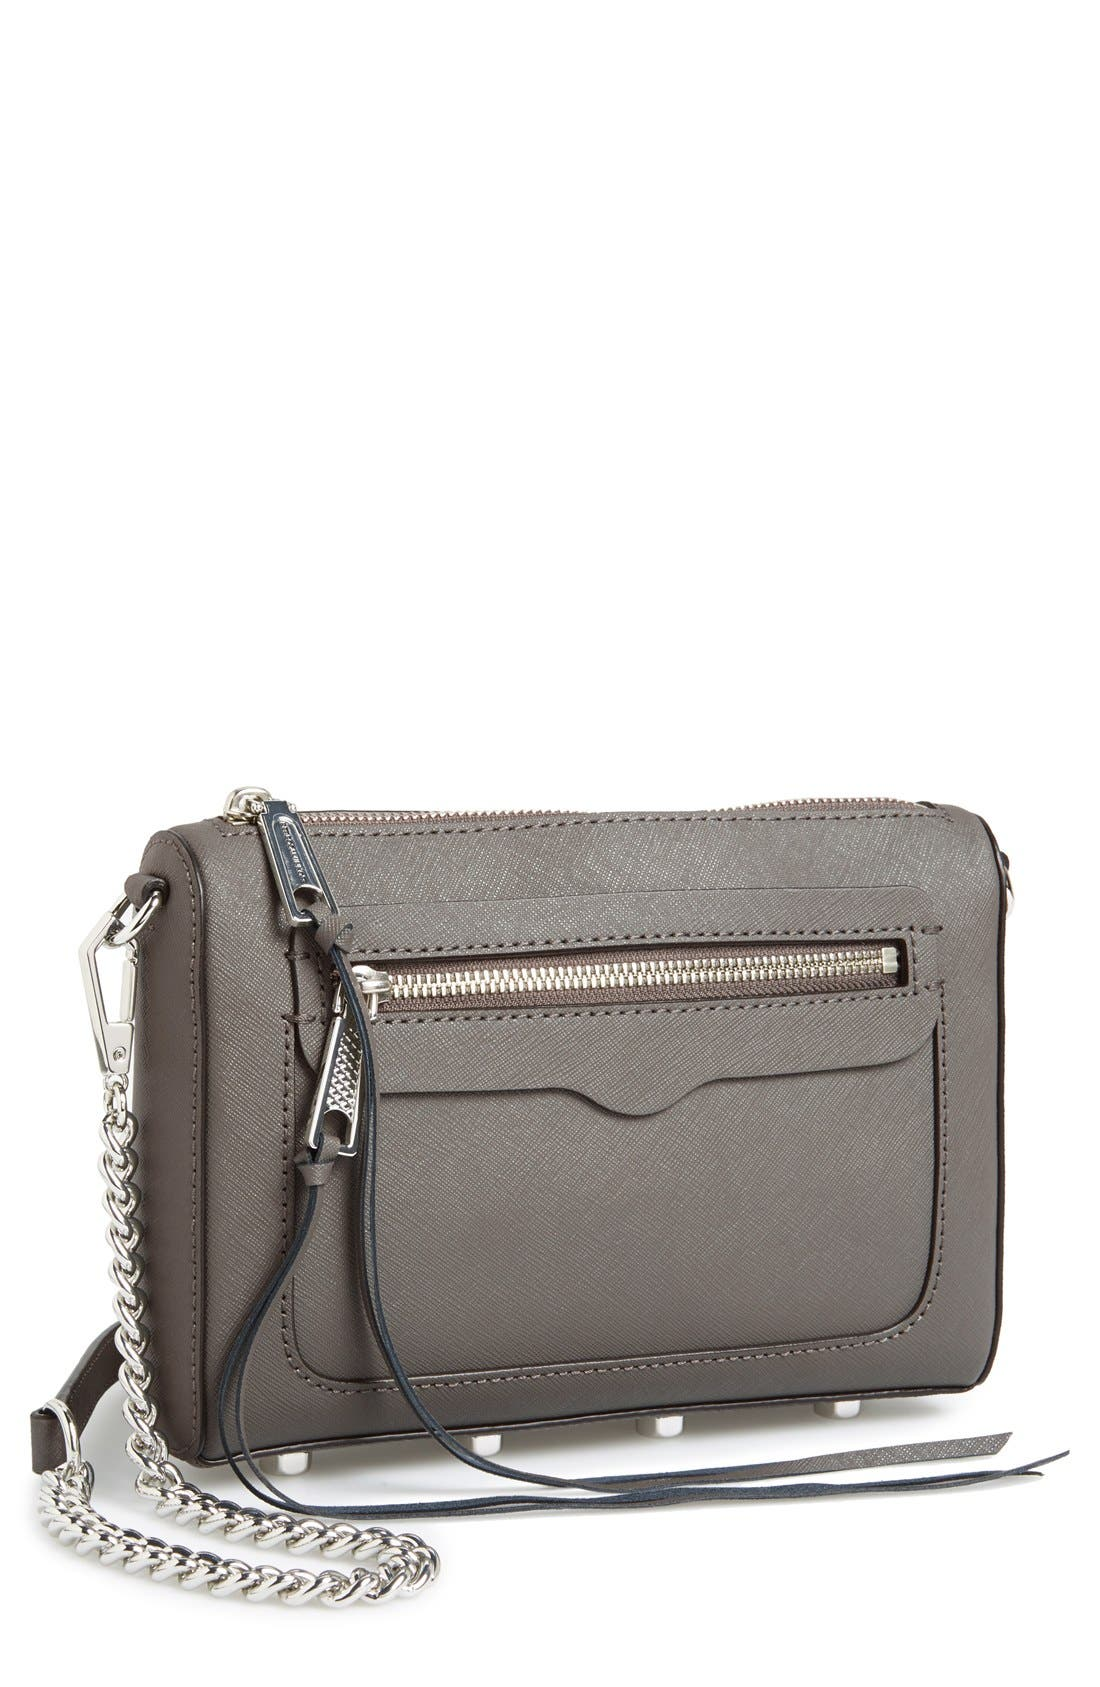 'Avery' Crossbody Bag, Main, color, 021